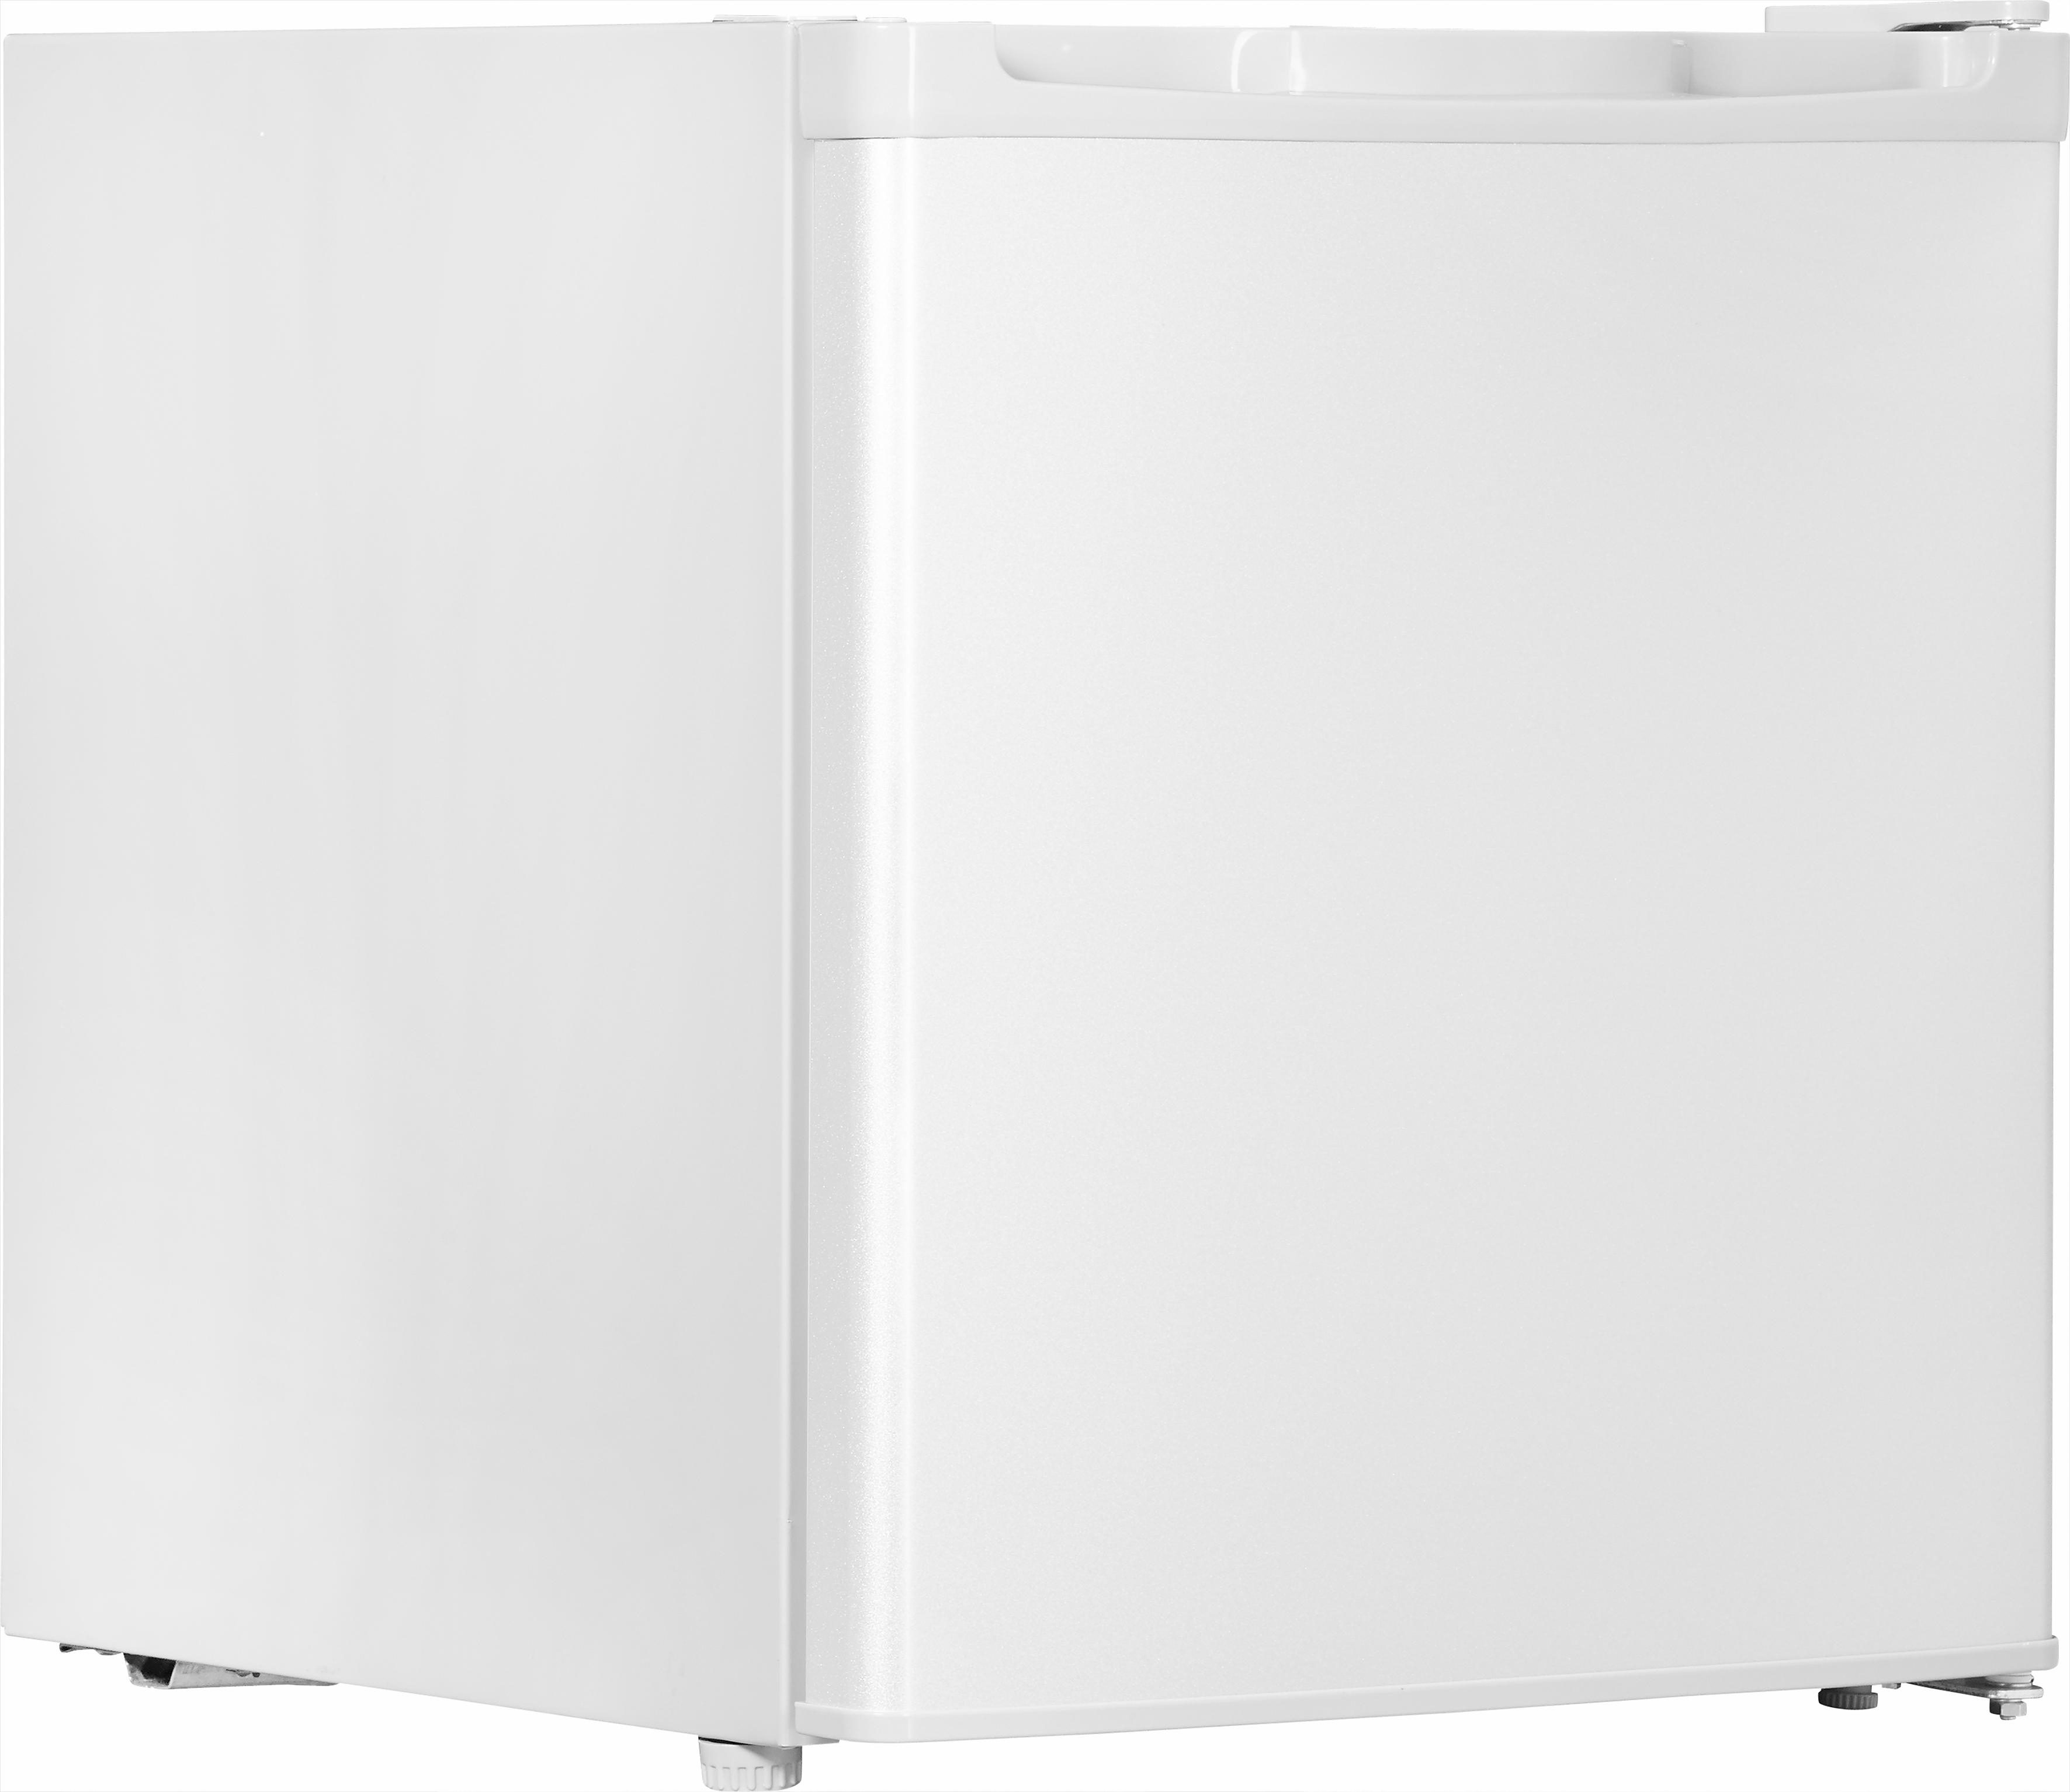 Hanseatic Kühlschrank HMKS5144 A1, Energieklasse A+, 51 cm hoch